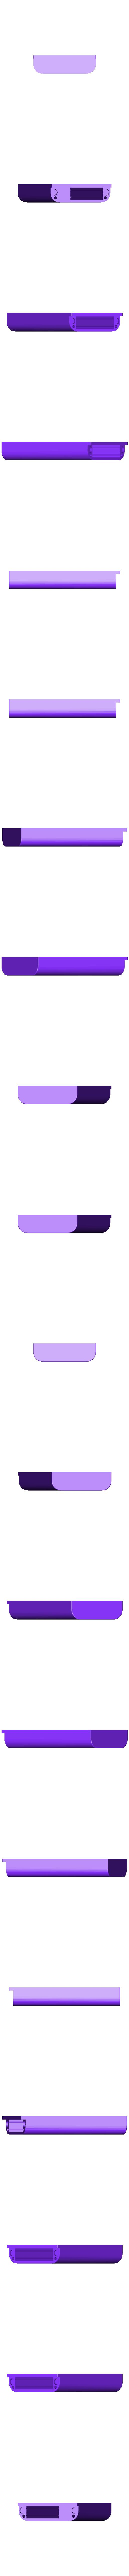 cashStash_Body_v01_noText.STL Download free STL file Magnetic WiFi Repeater Stash Box for Cash & Valuables • 3D printing model, sneaks